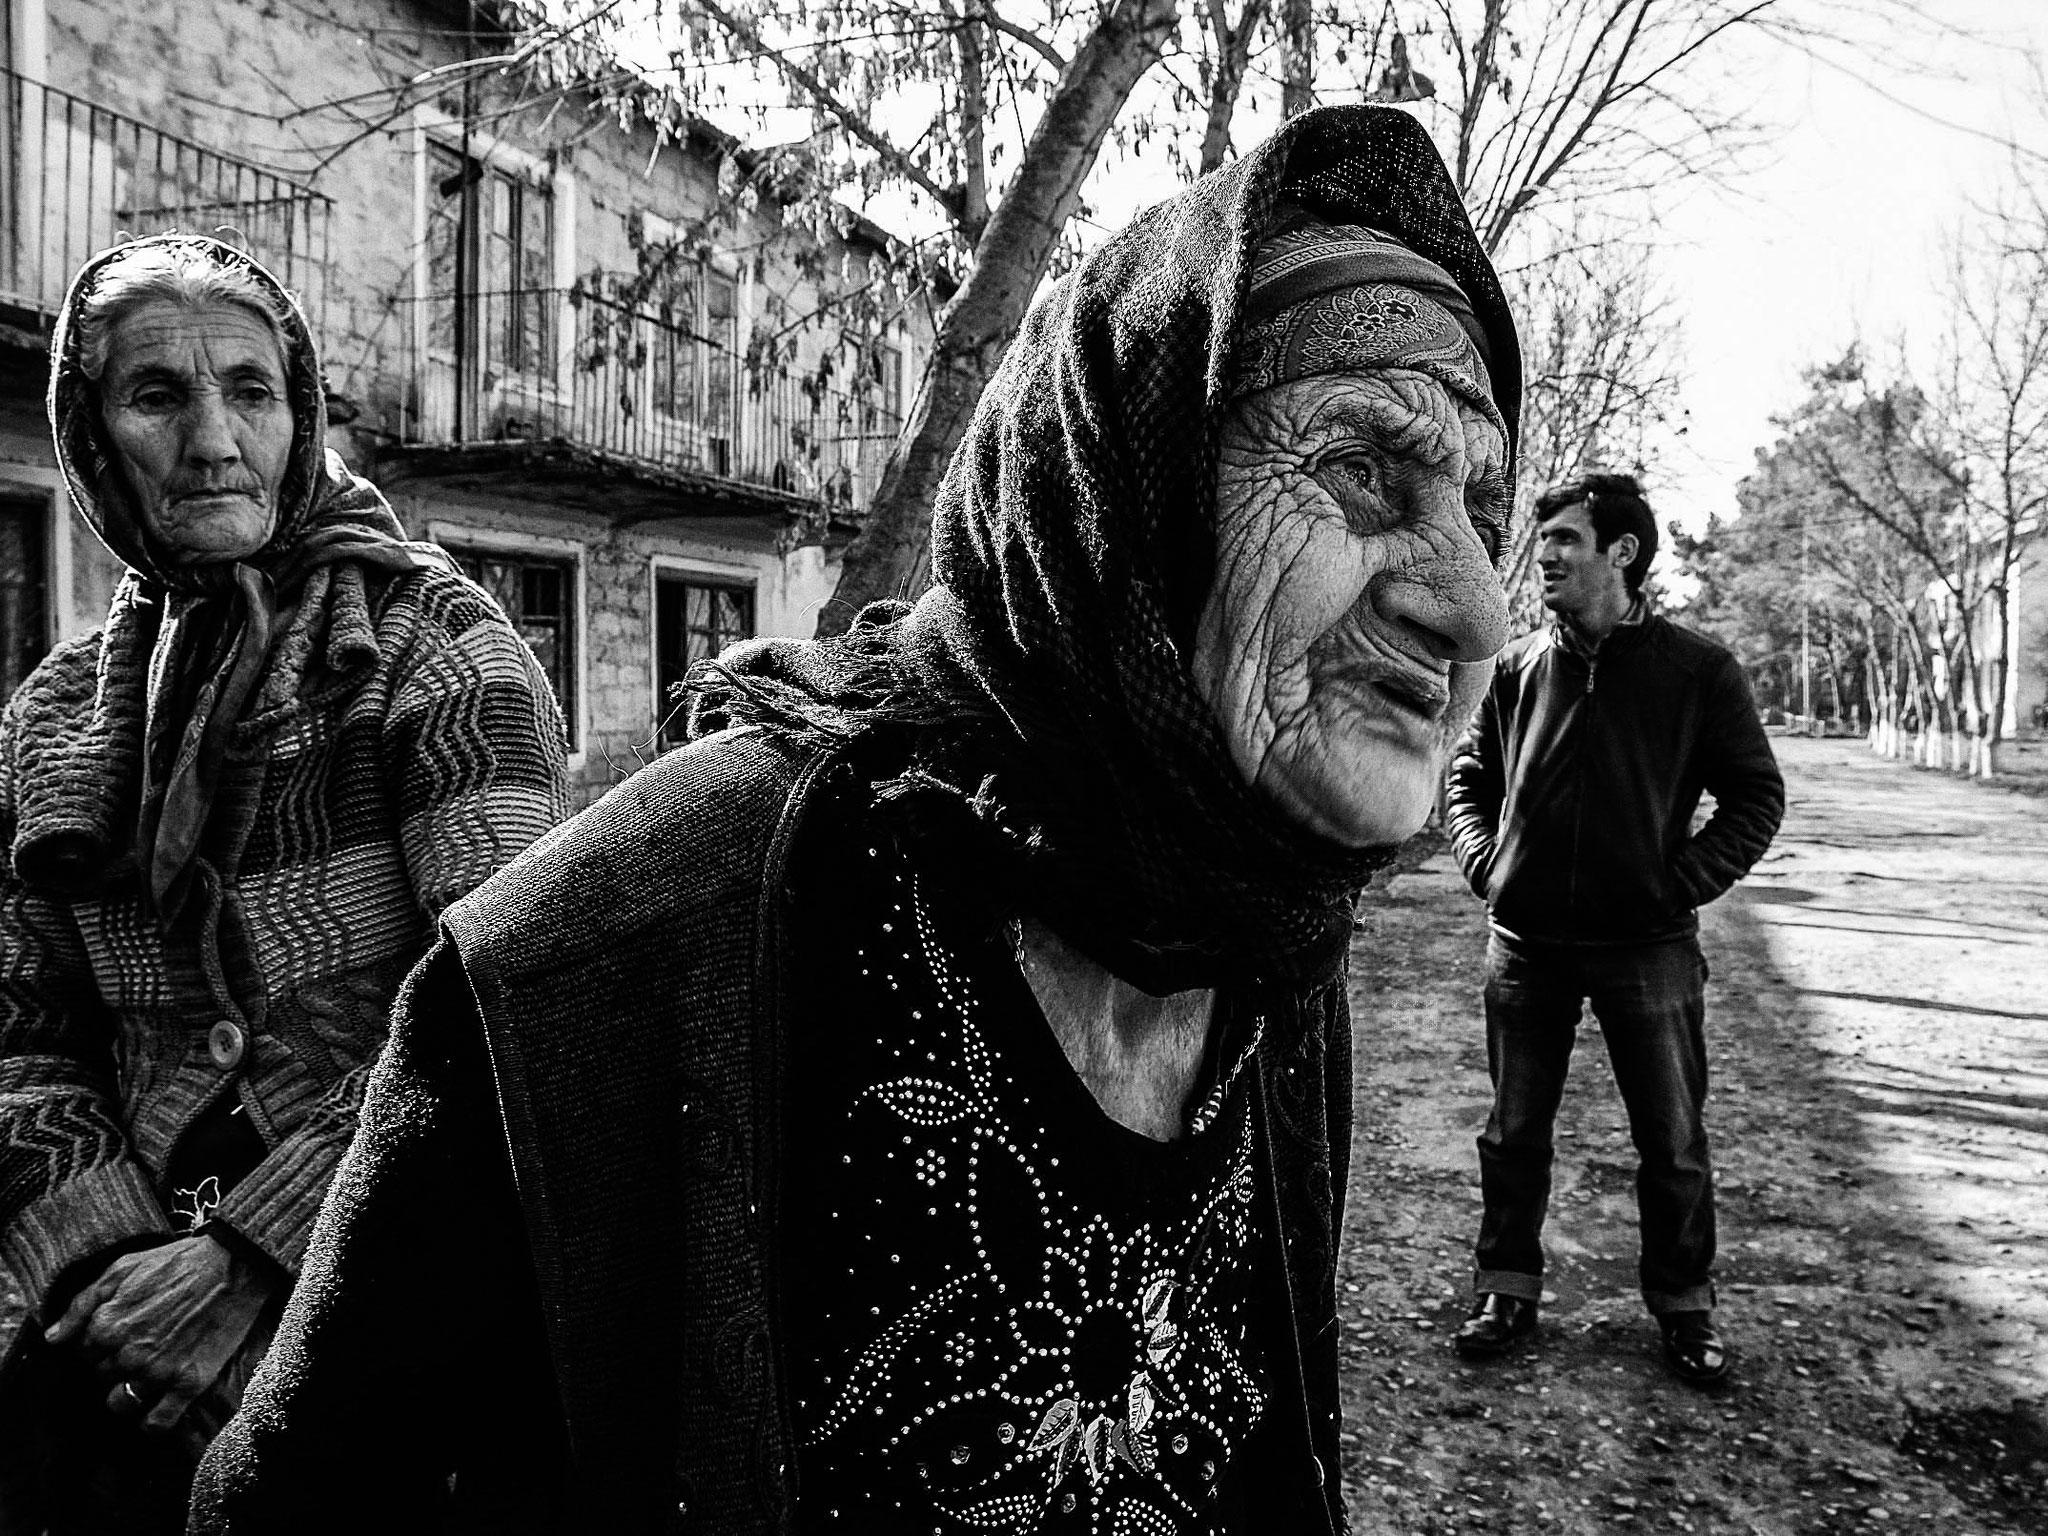 Collective house for IDPs from Nogorno Karabakh, AZ